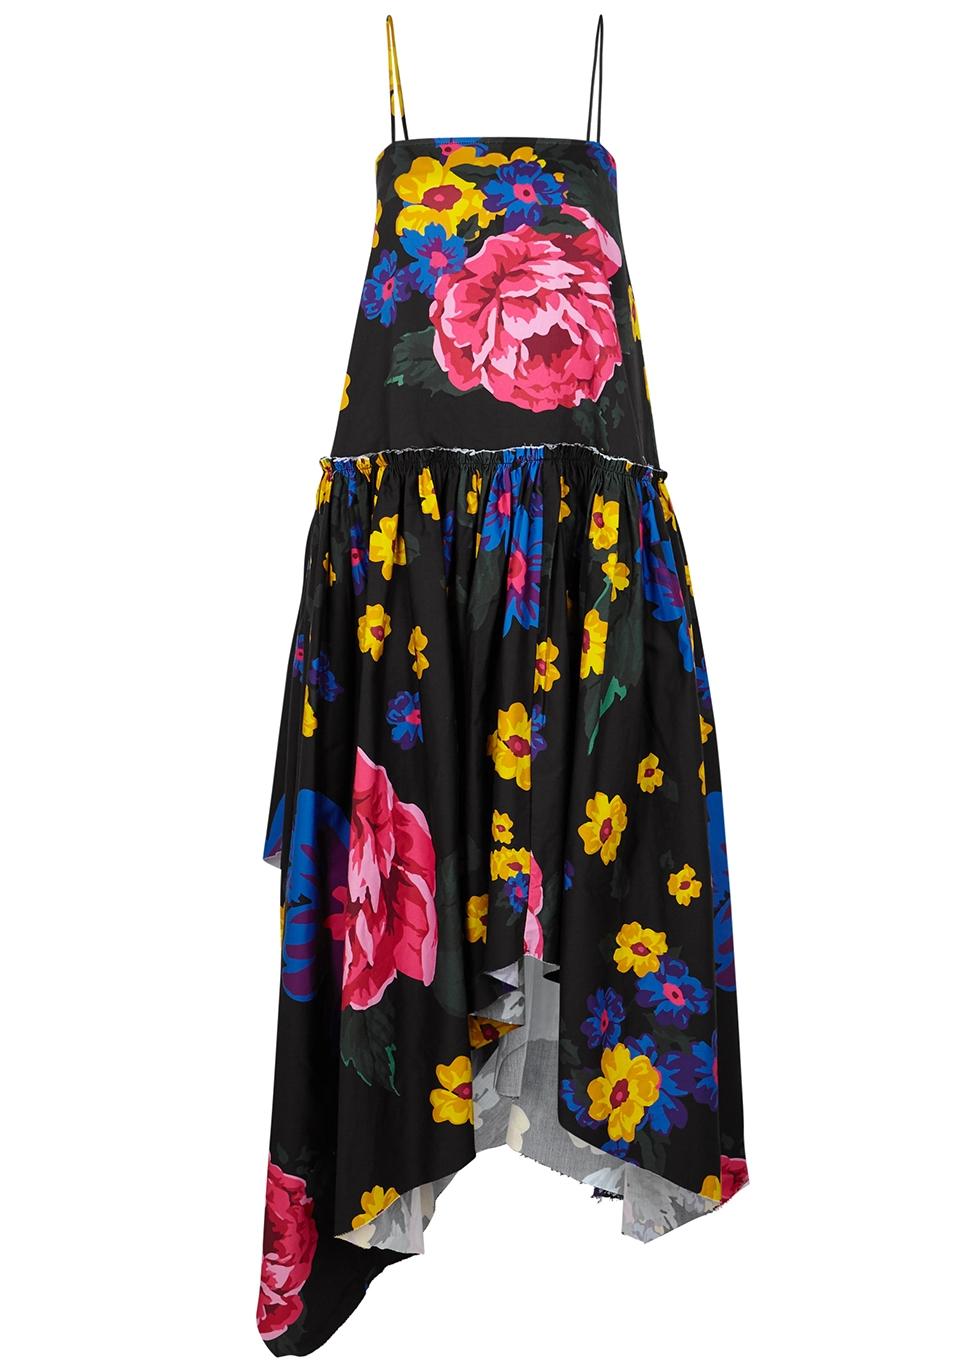 Black cotton dress - Marques' Almeida